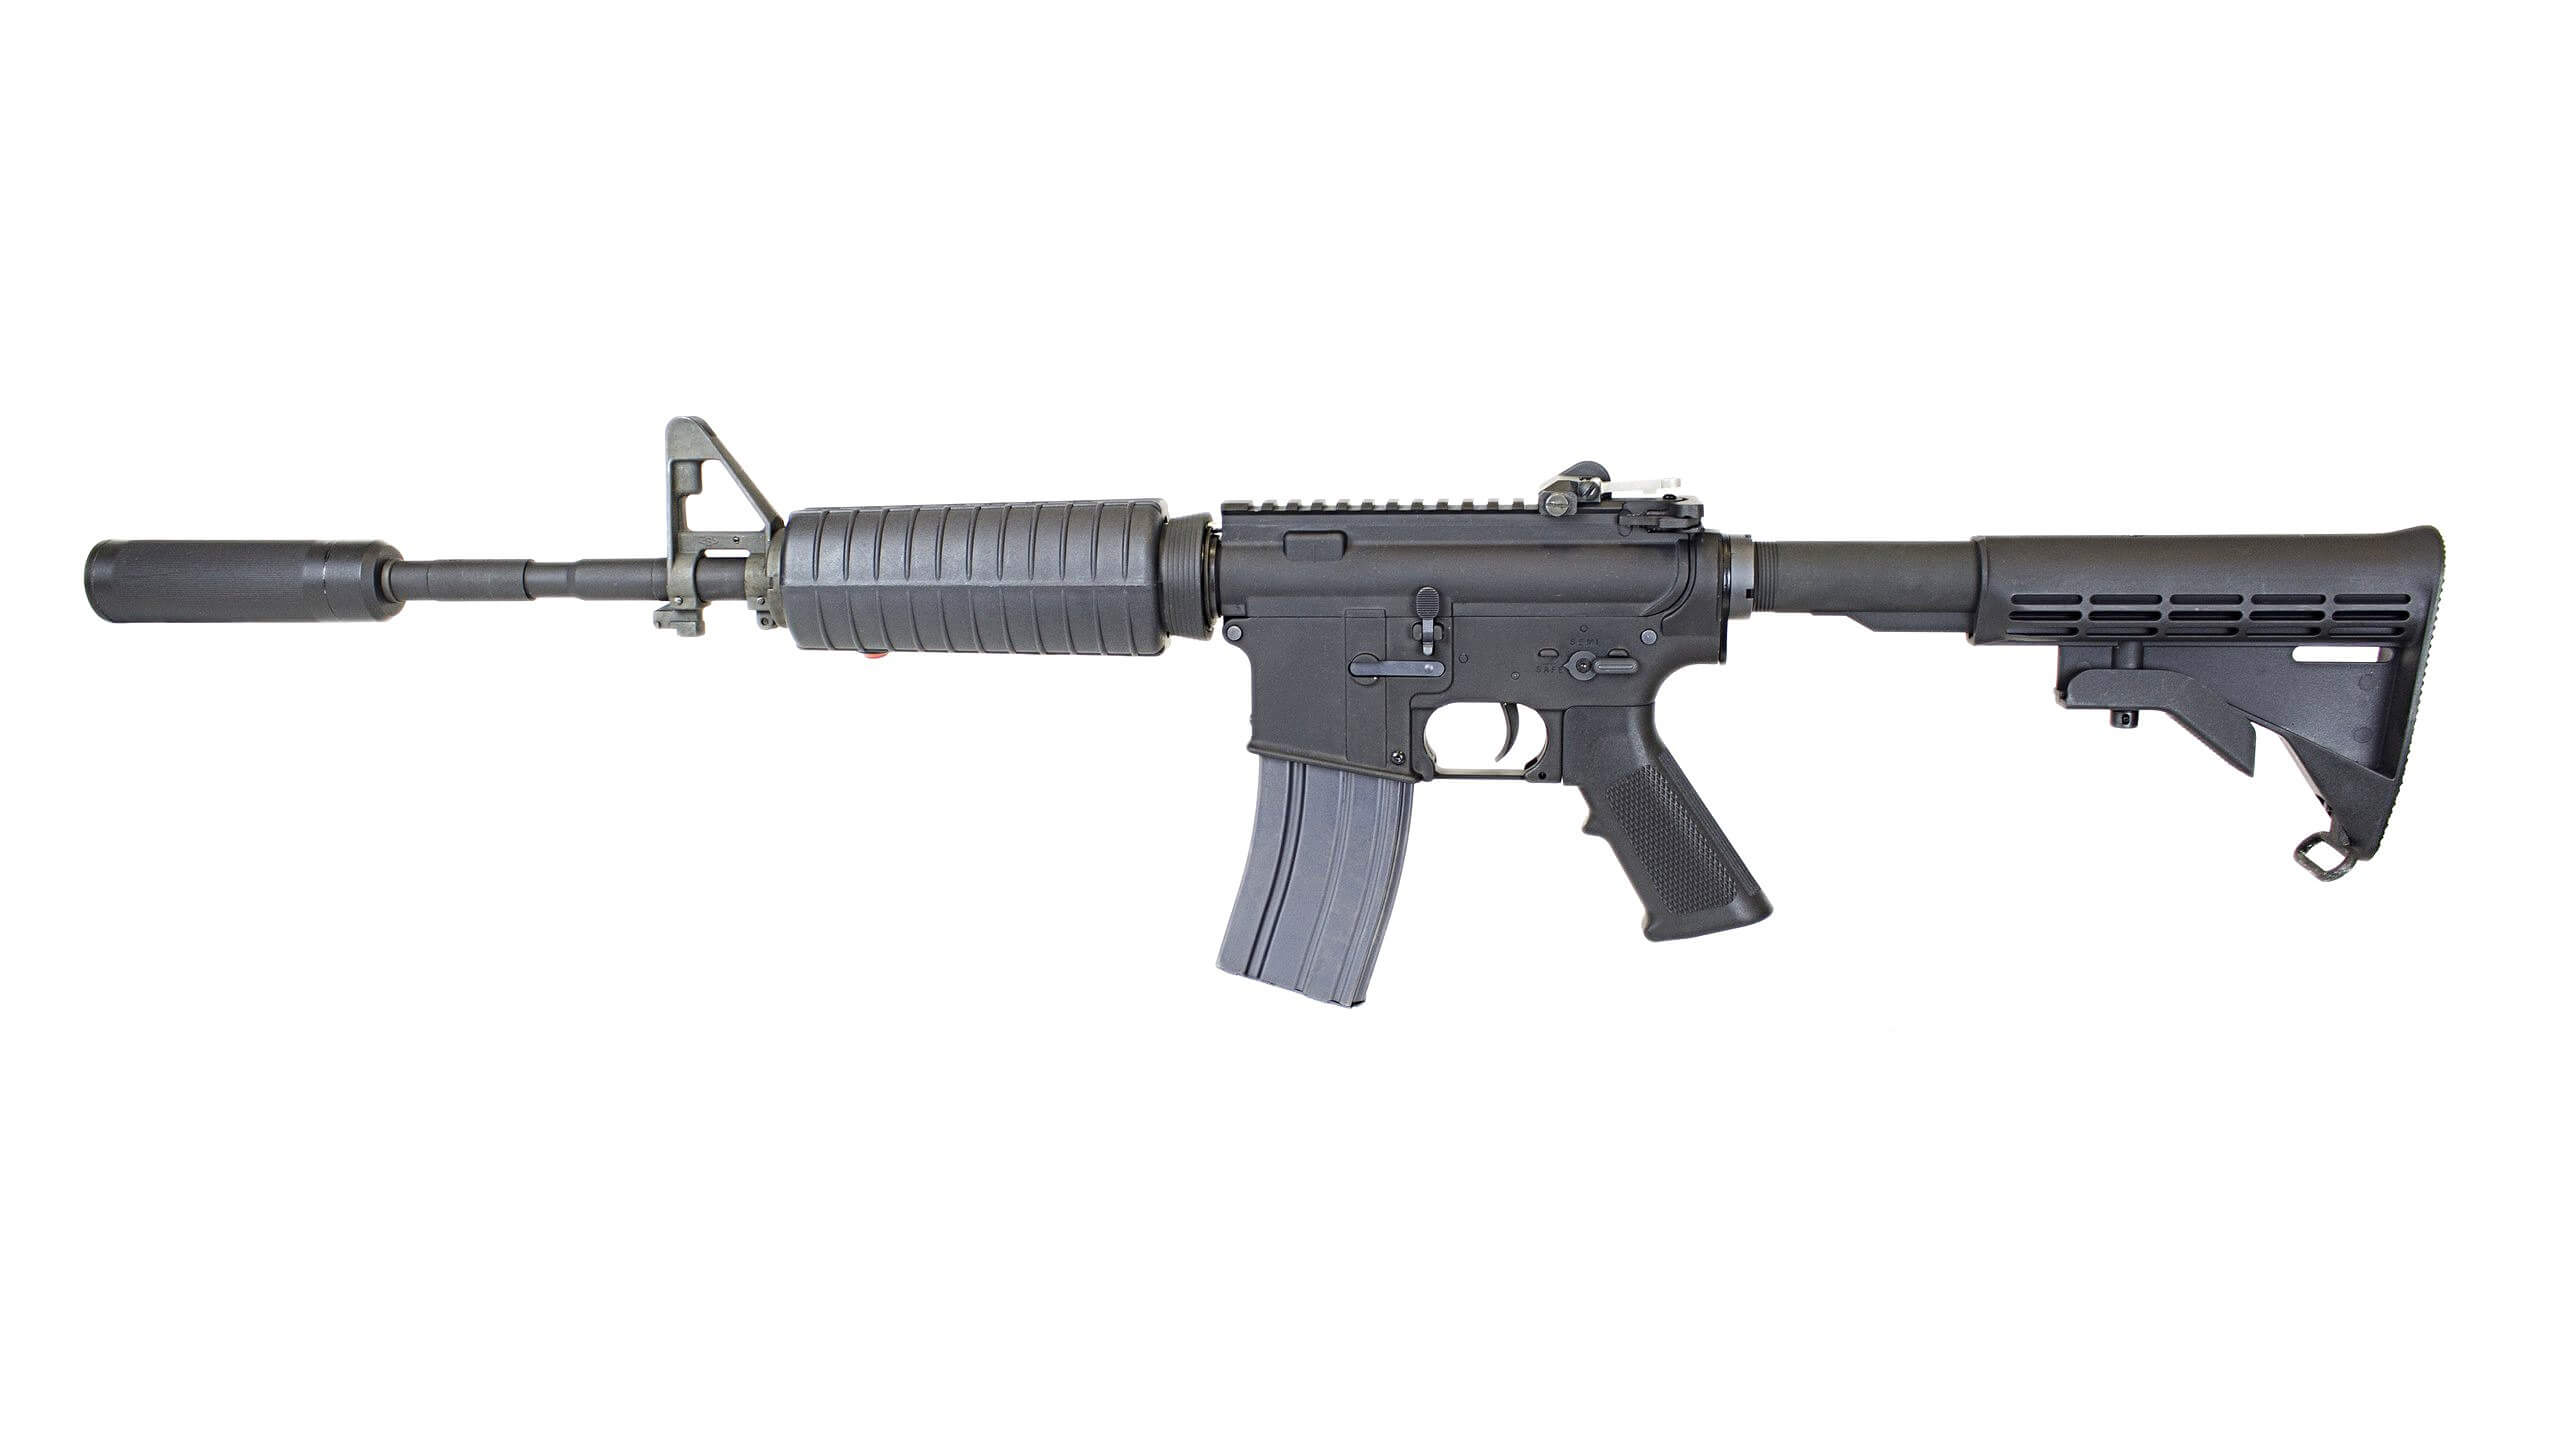 Airsoft M4a1 Carbine Full Metal